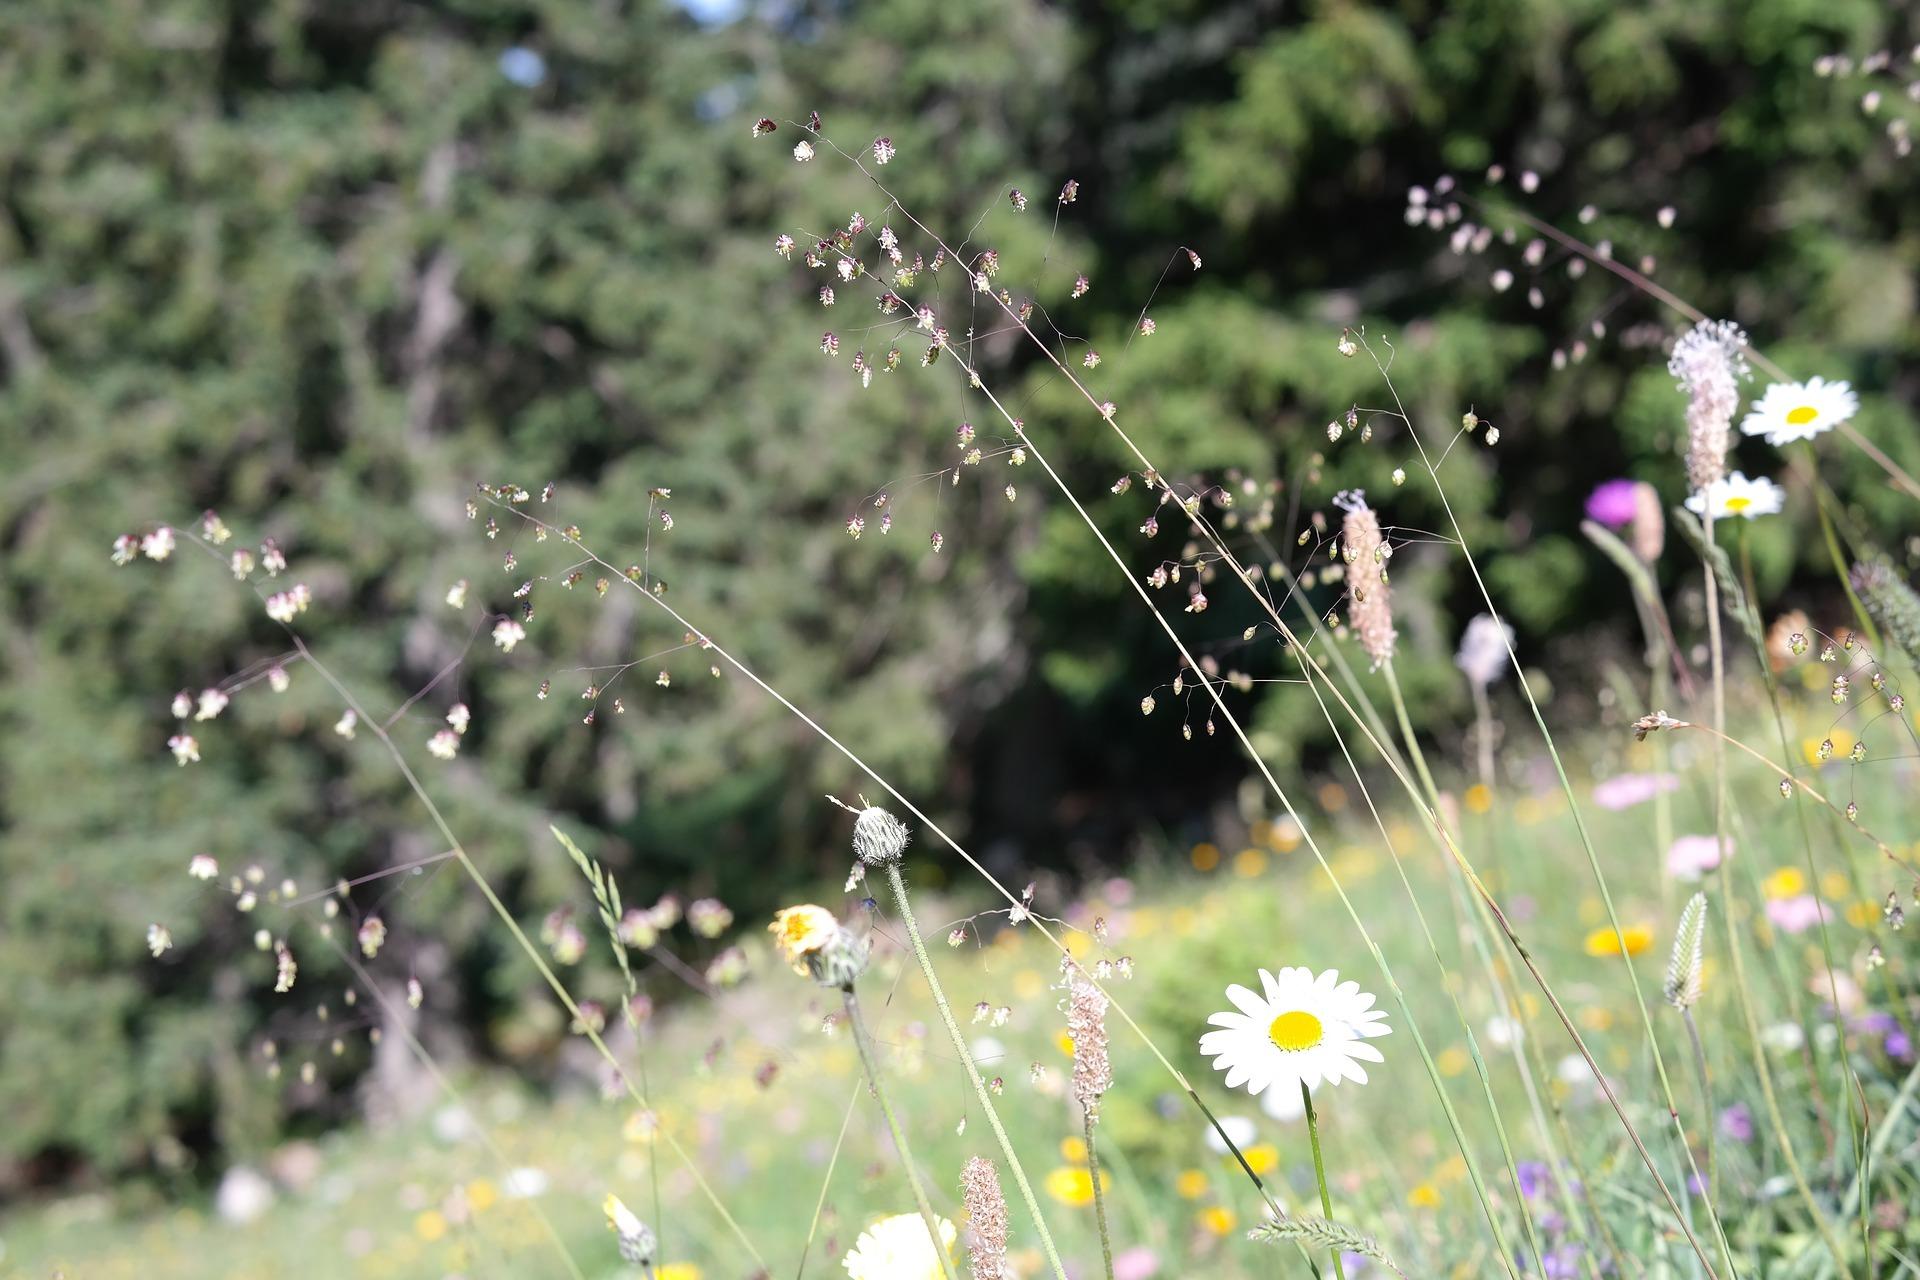 quaking-grass-1837773_1920.jpg